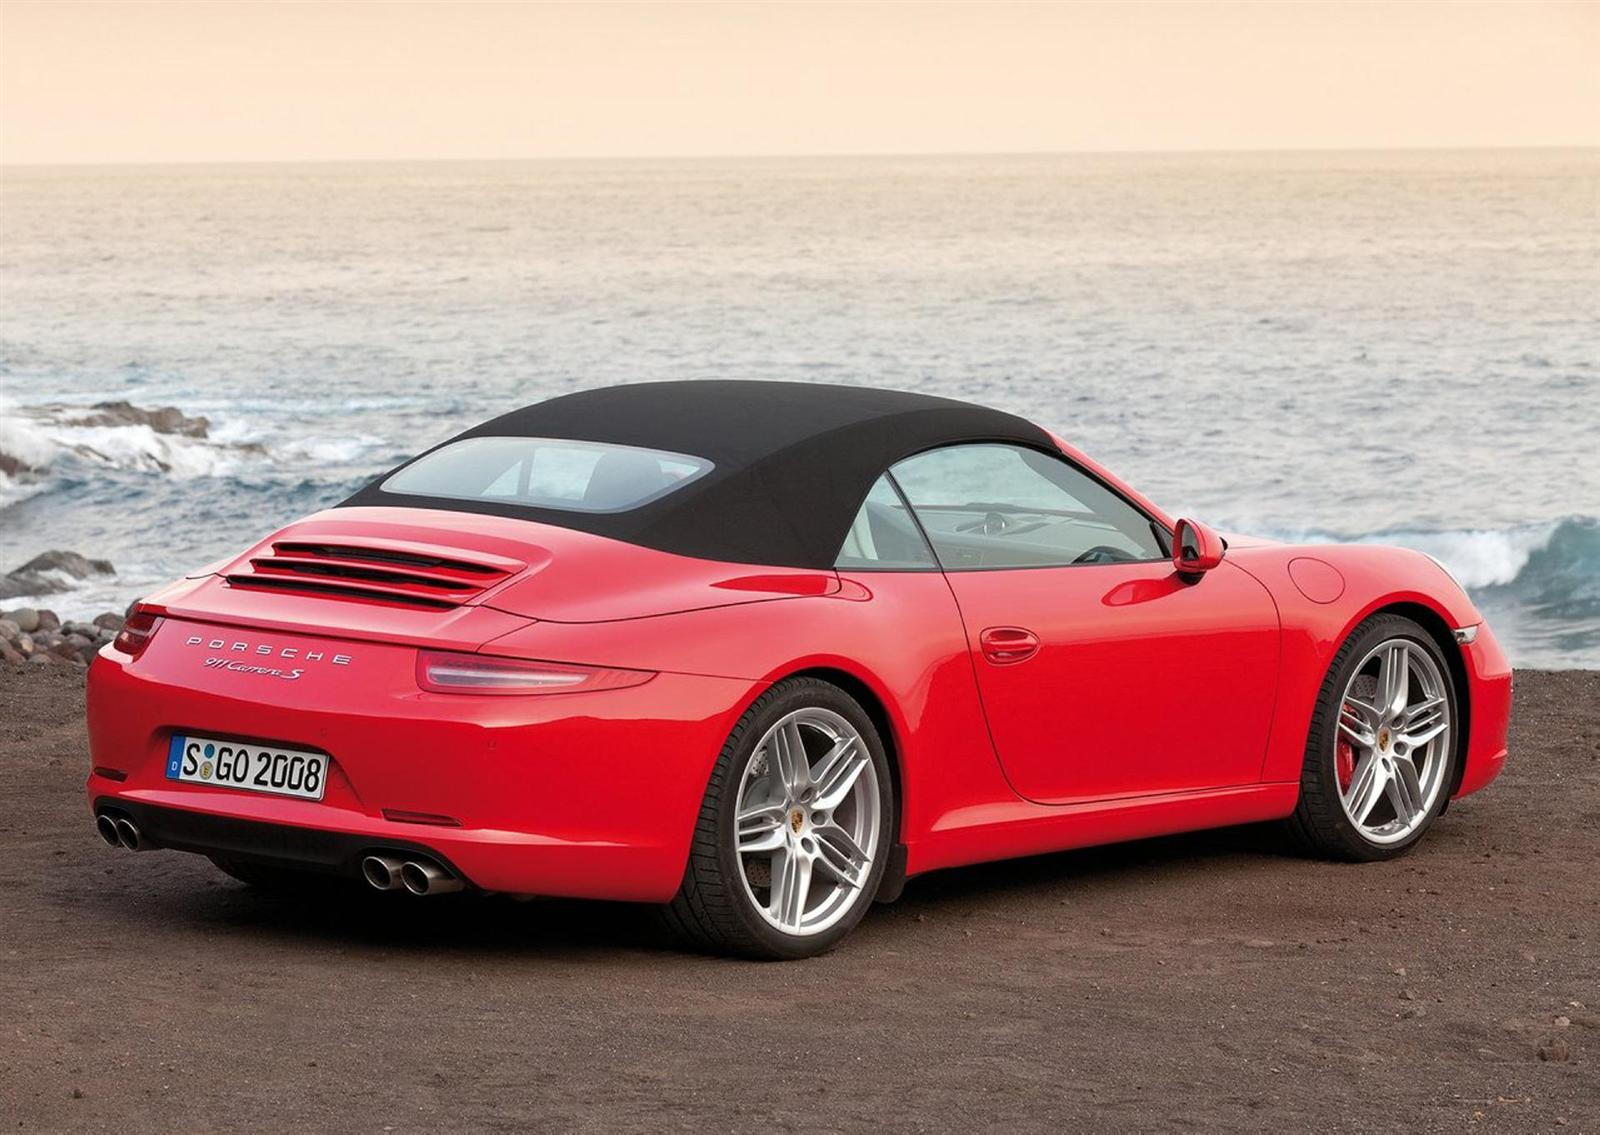 2013 Porsche 911 Carrera S Image